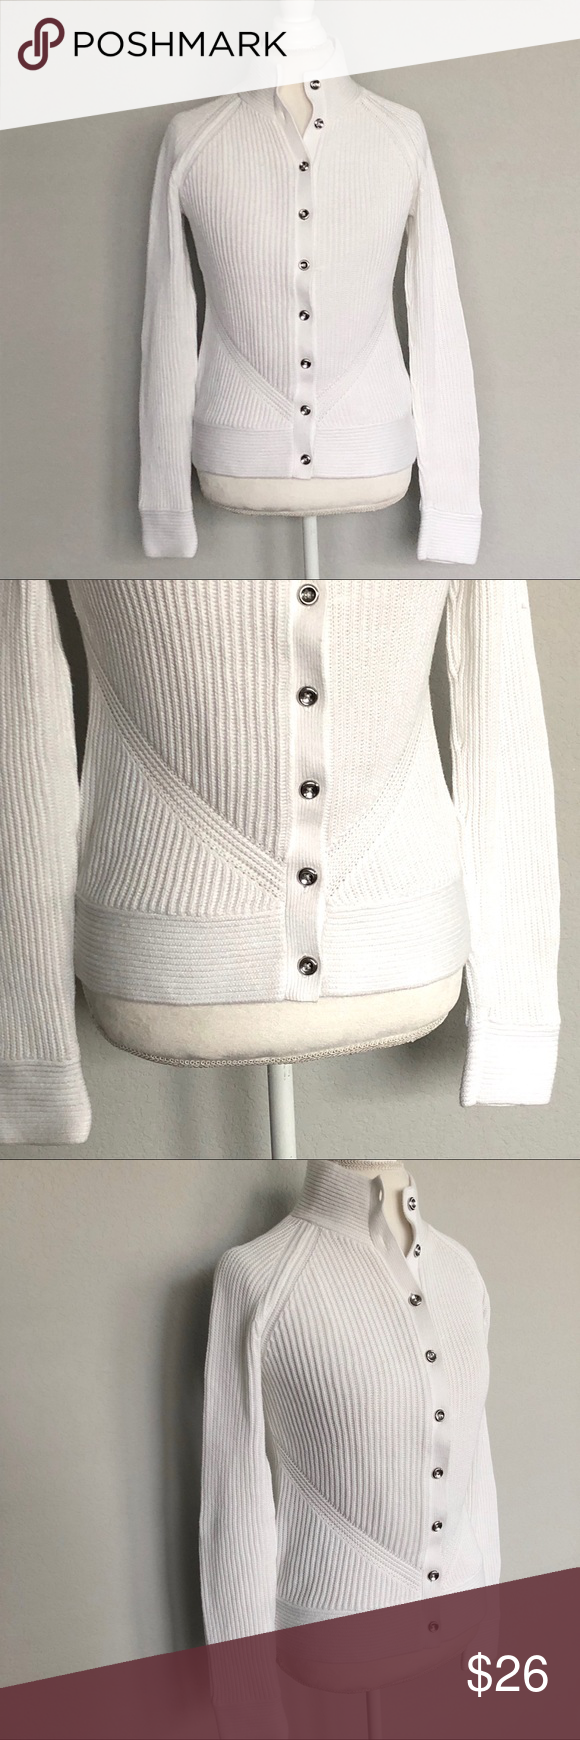 Banana Republic Sweater Jacket SZ Medium   Silver buttons, White ...